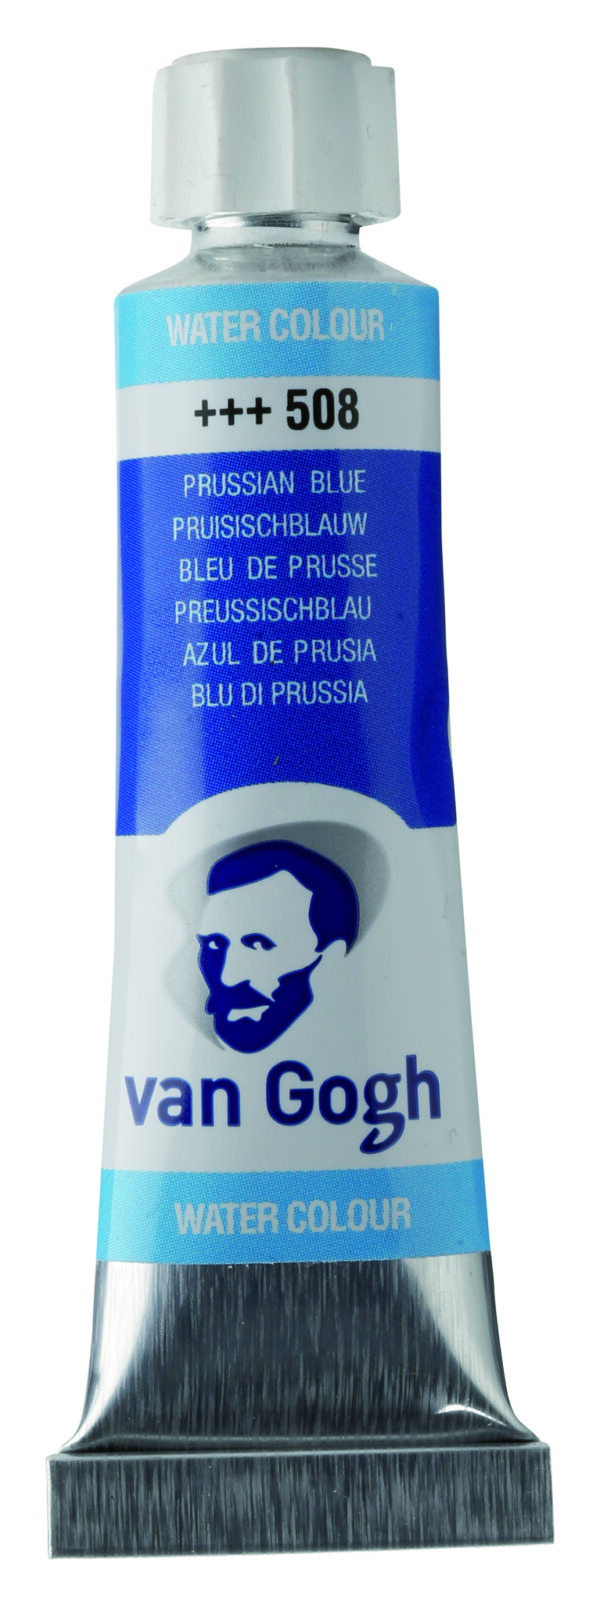 Van Gogh 508 Prussian blue - 10 ml